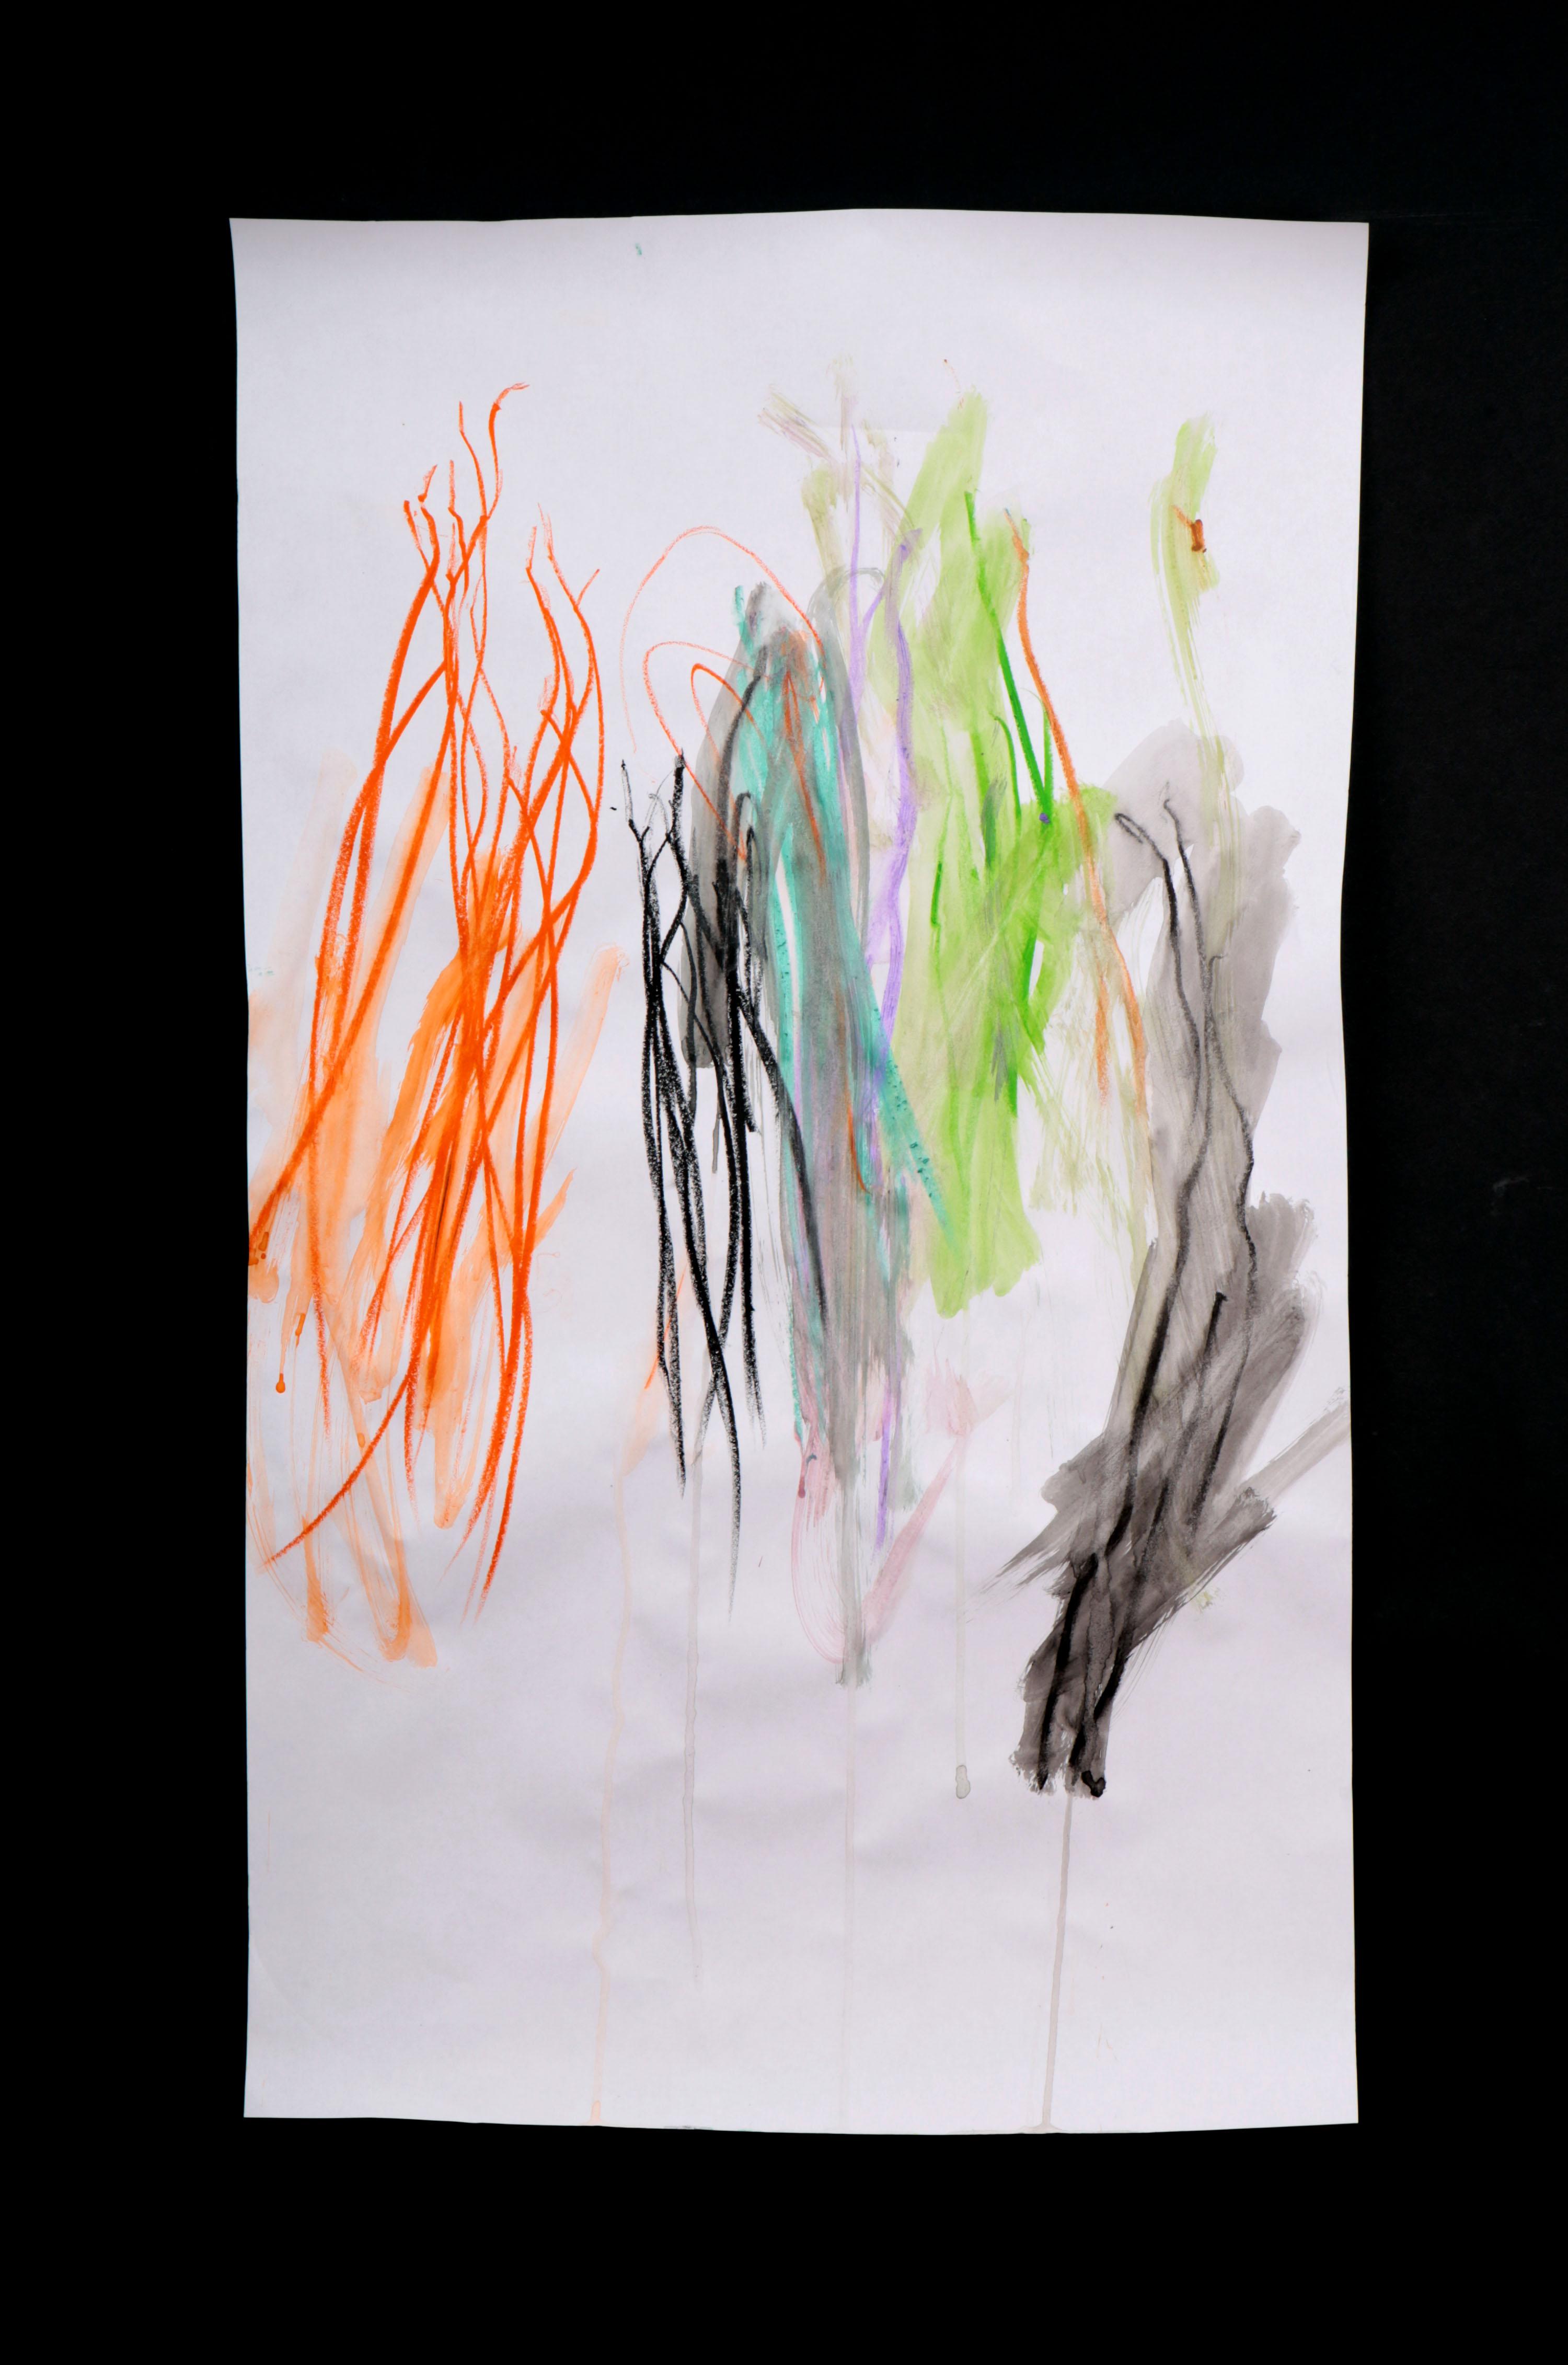 Art by Anastasia. Untitled #78. Gel sticks on paper.